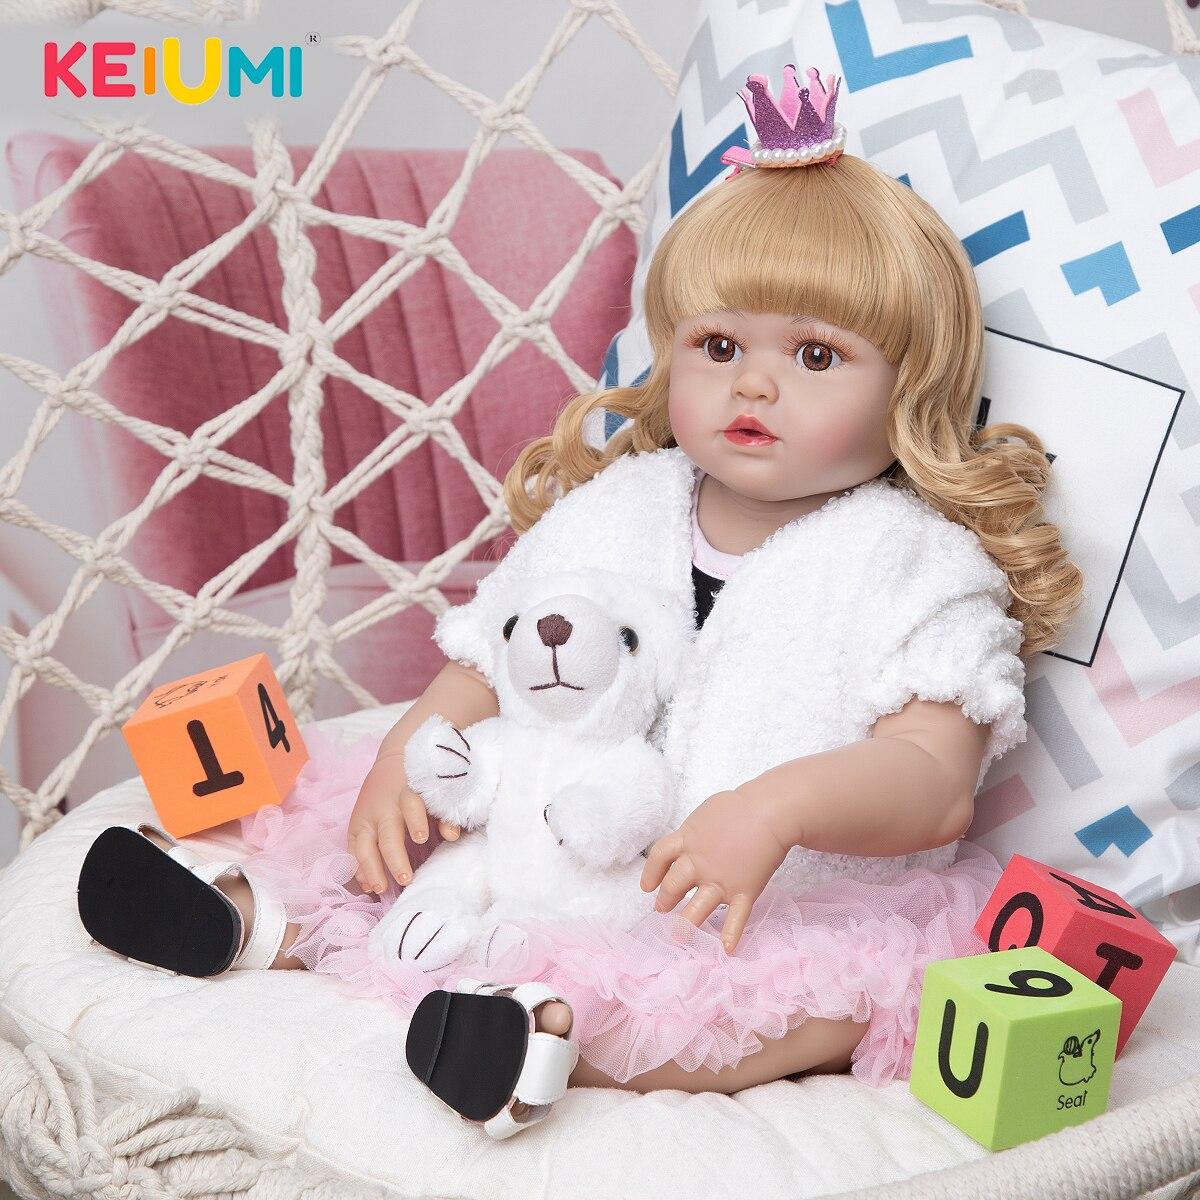 KEIUMI Hot Sale Reborn Dolls Full Vinyl Body 57cm Lifelike Fashion Princess Baby Doll Boneca Reborn Toy For Children's Day Gift